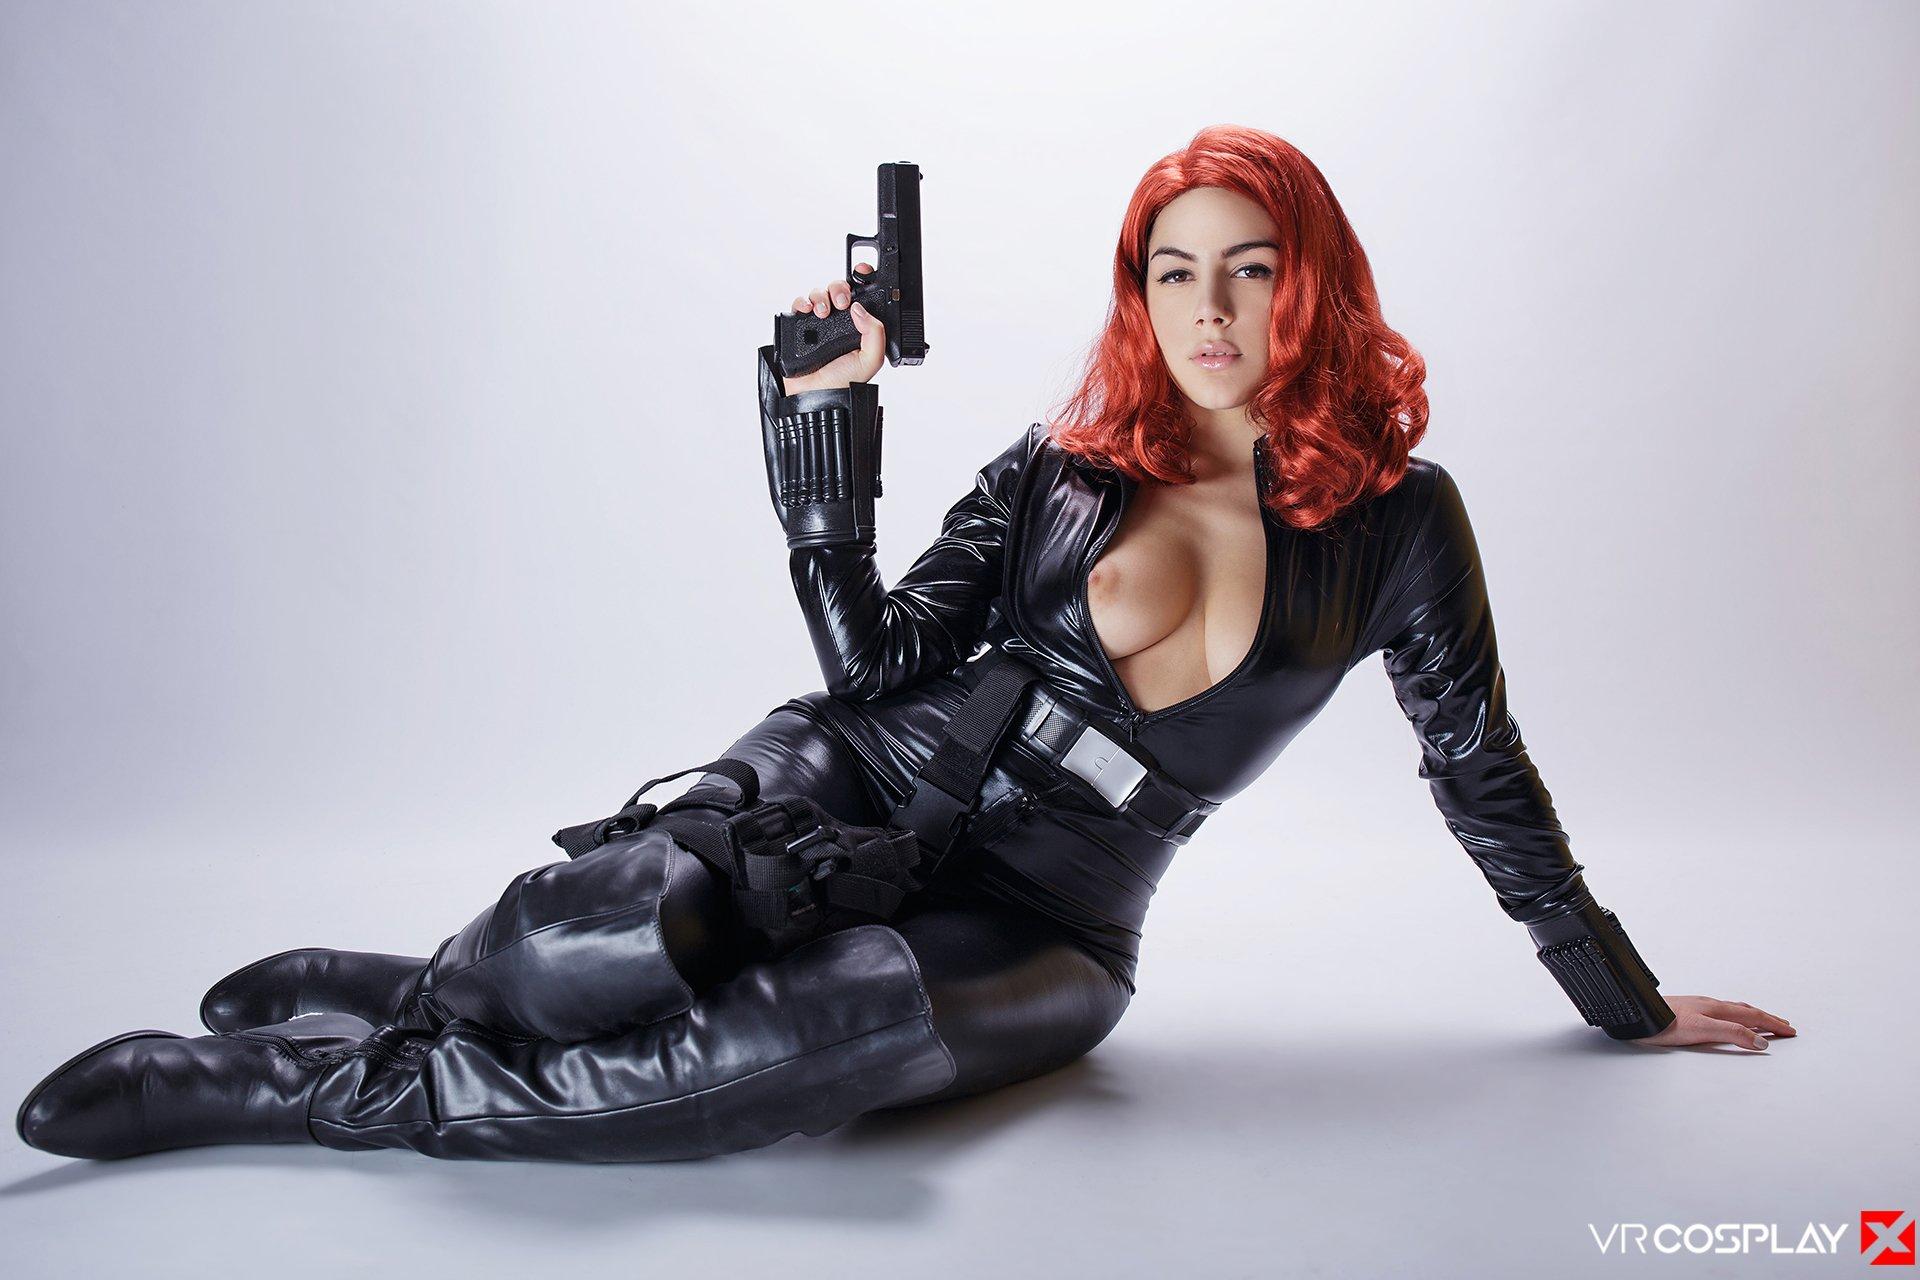 Avegers Porn Parody Torrent Castellano spiderman black widow porn - megapornx